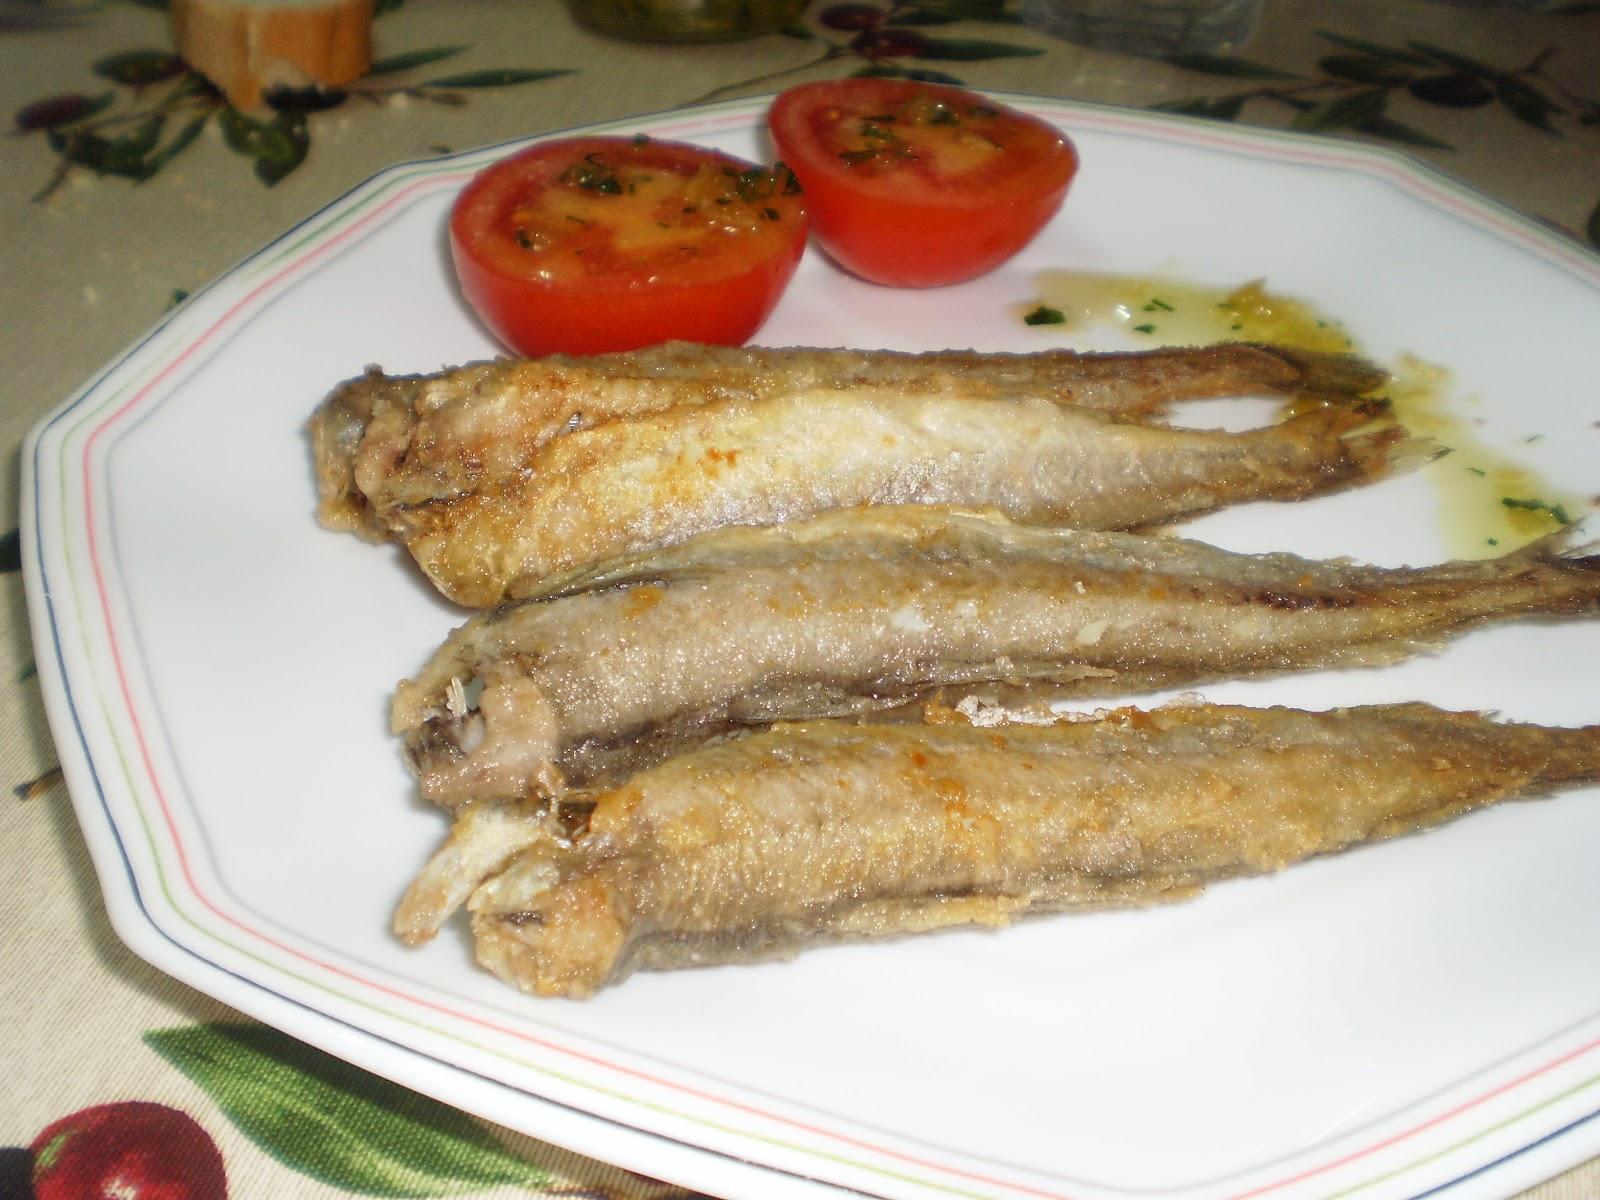 Cocina sin tonterias bacaladillas fritas for Comidas sin cocinar